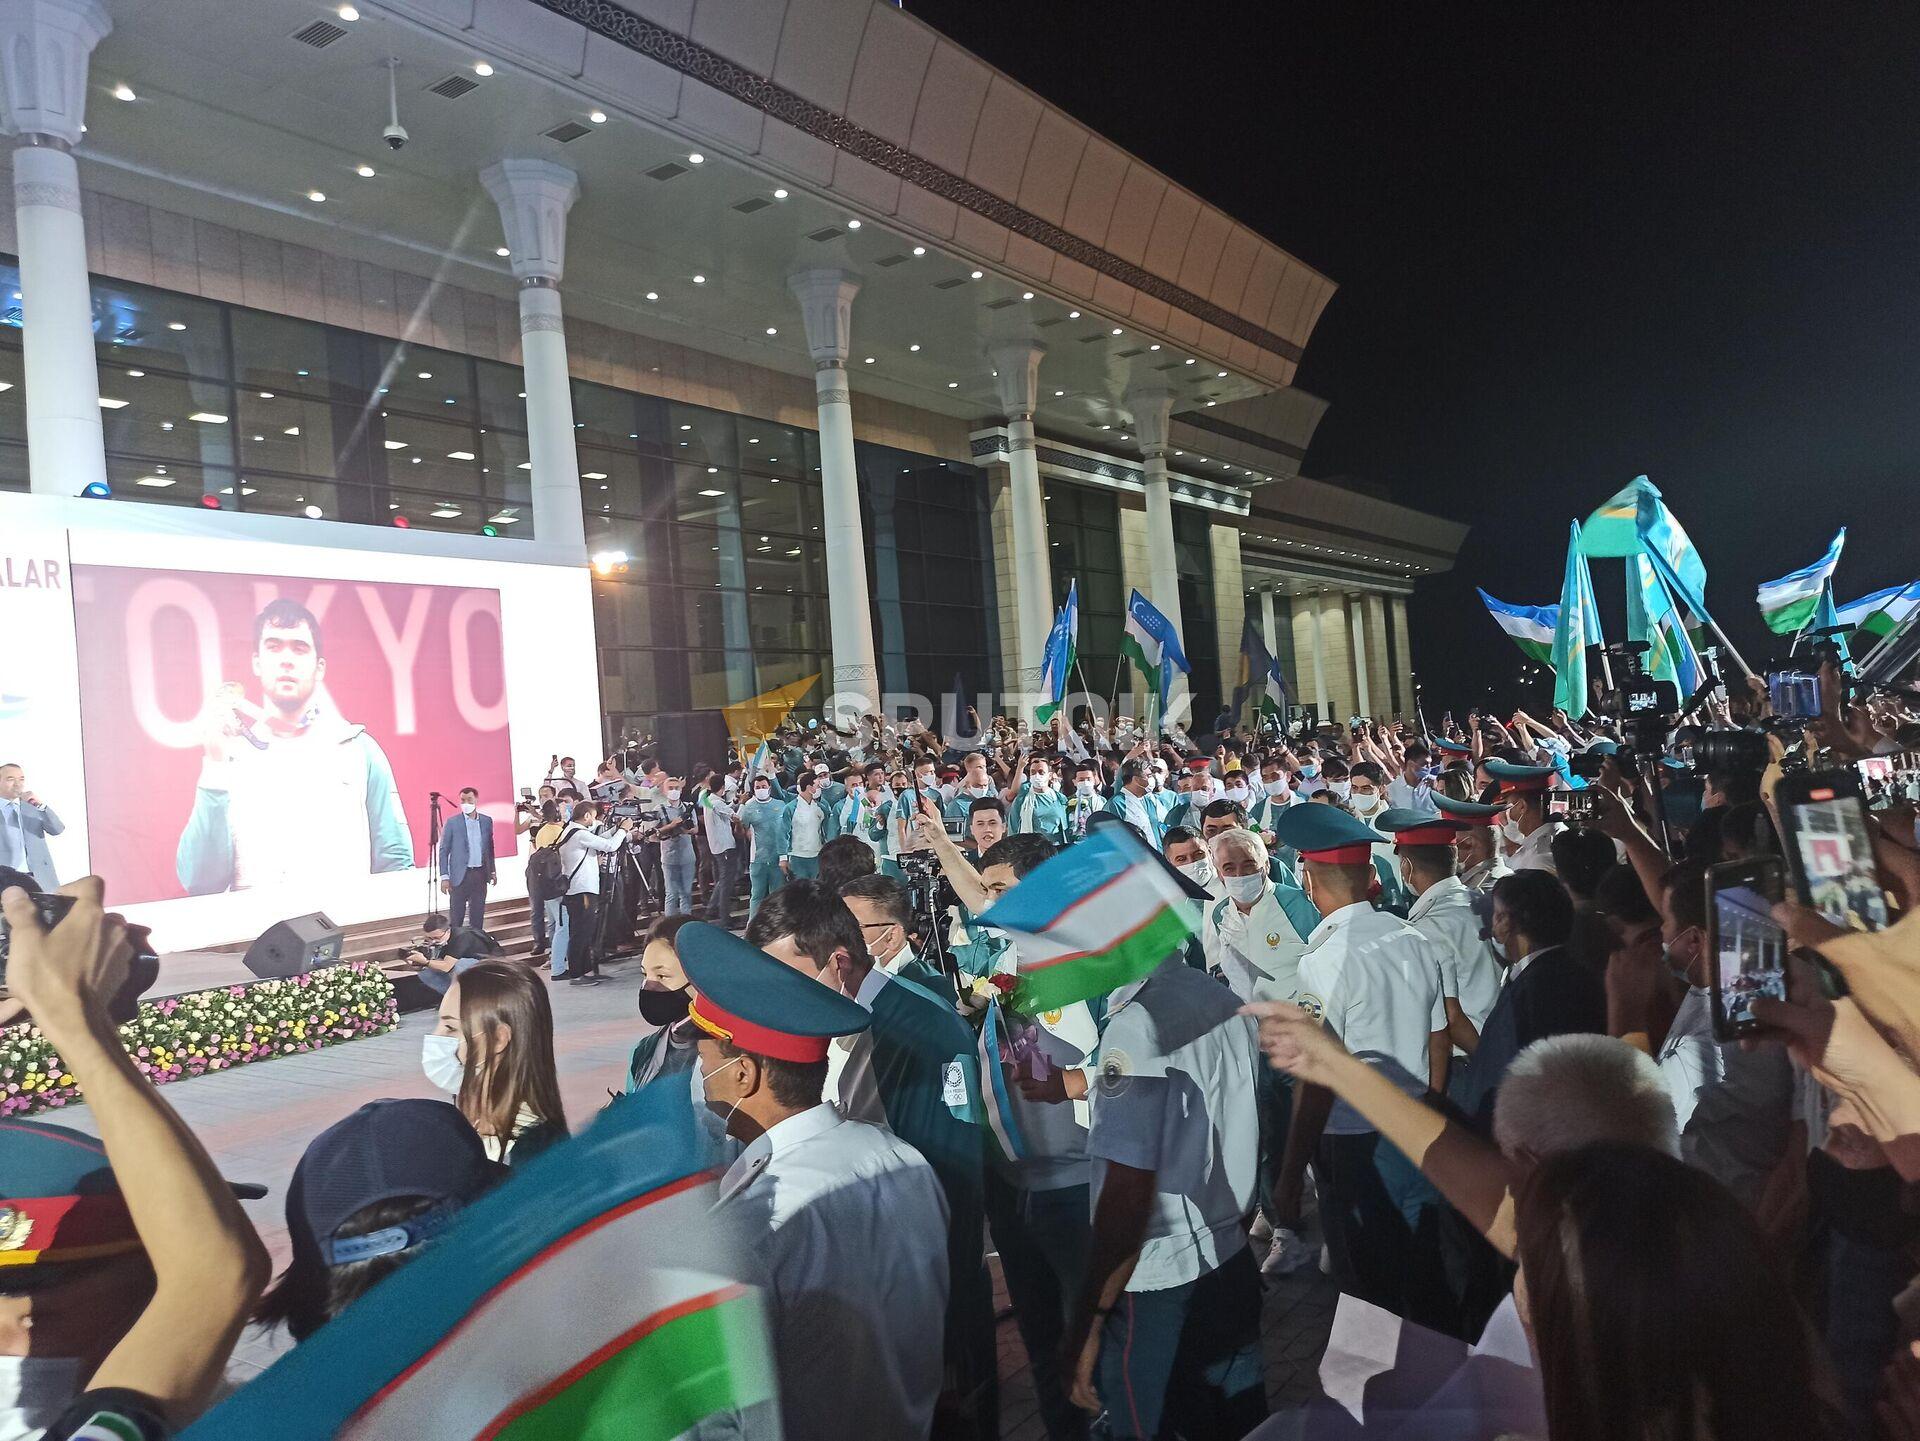 Ташкент встречает из Токио олимпийскую сборную Узбекистана - Sputnik Узбекистан, 1920, 09.08.2021